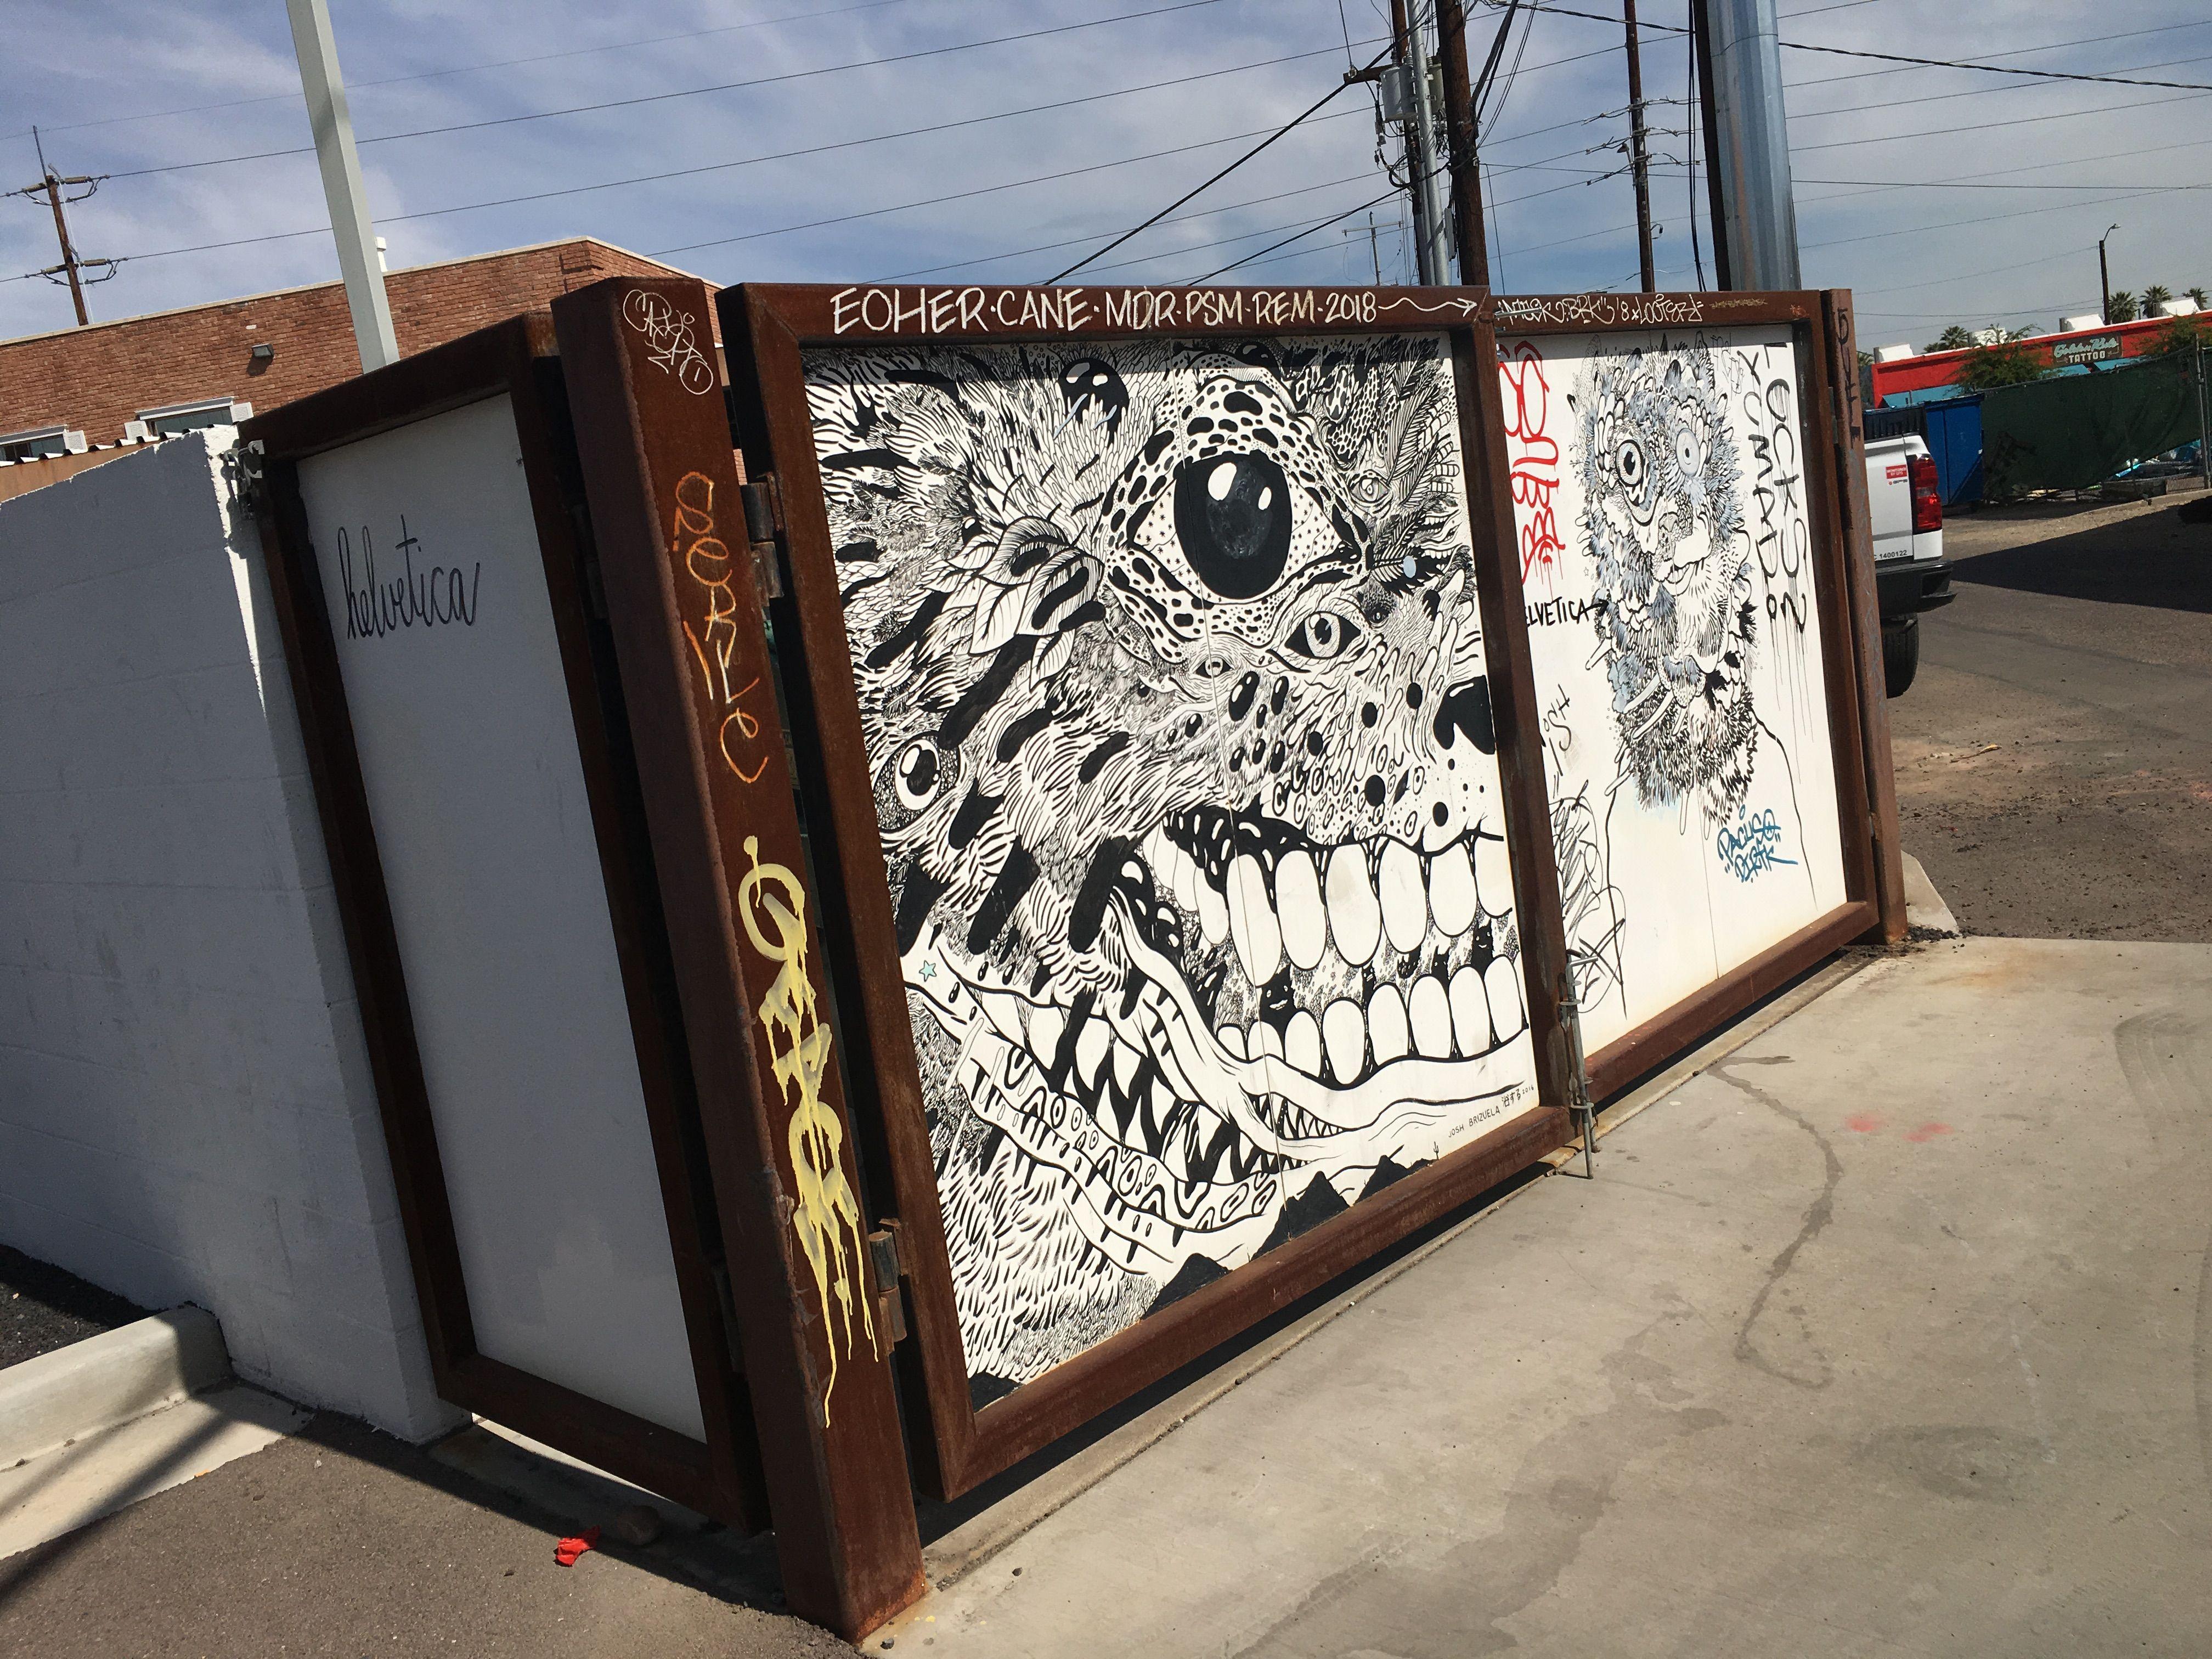 Downtown phoenix sharpie josh brizuela graffiti